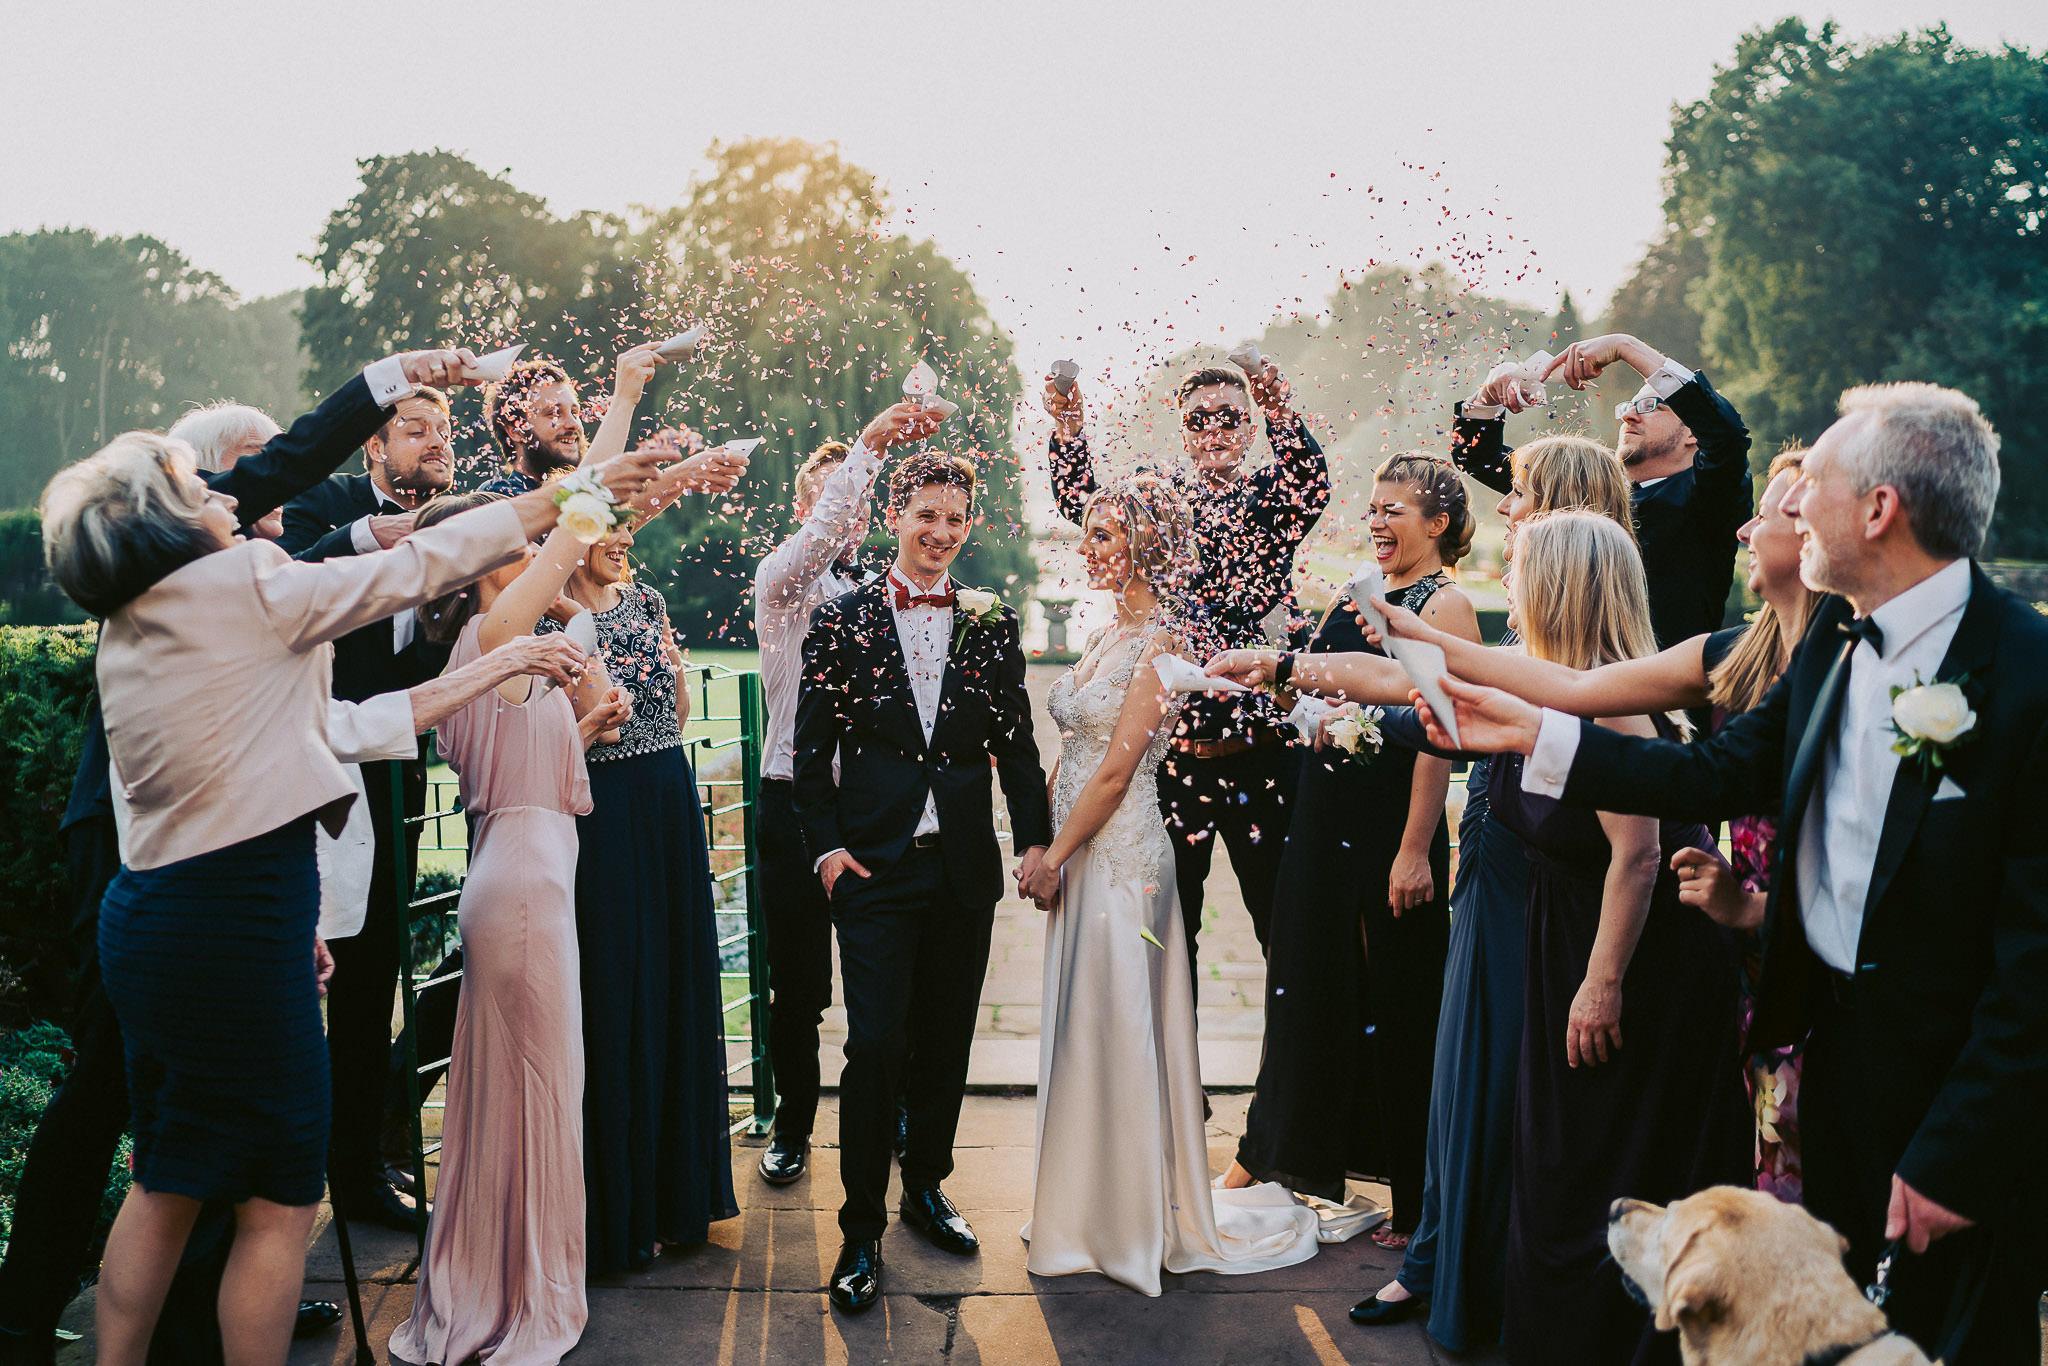 Staffordshire-Wedding-Photographer-130.jpg